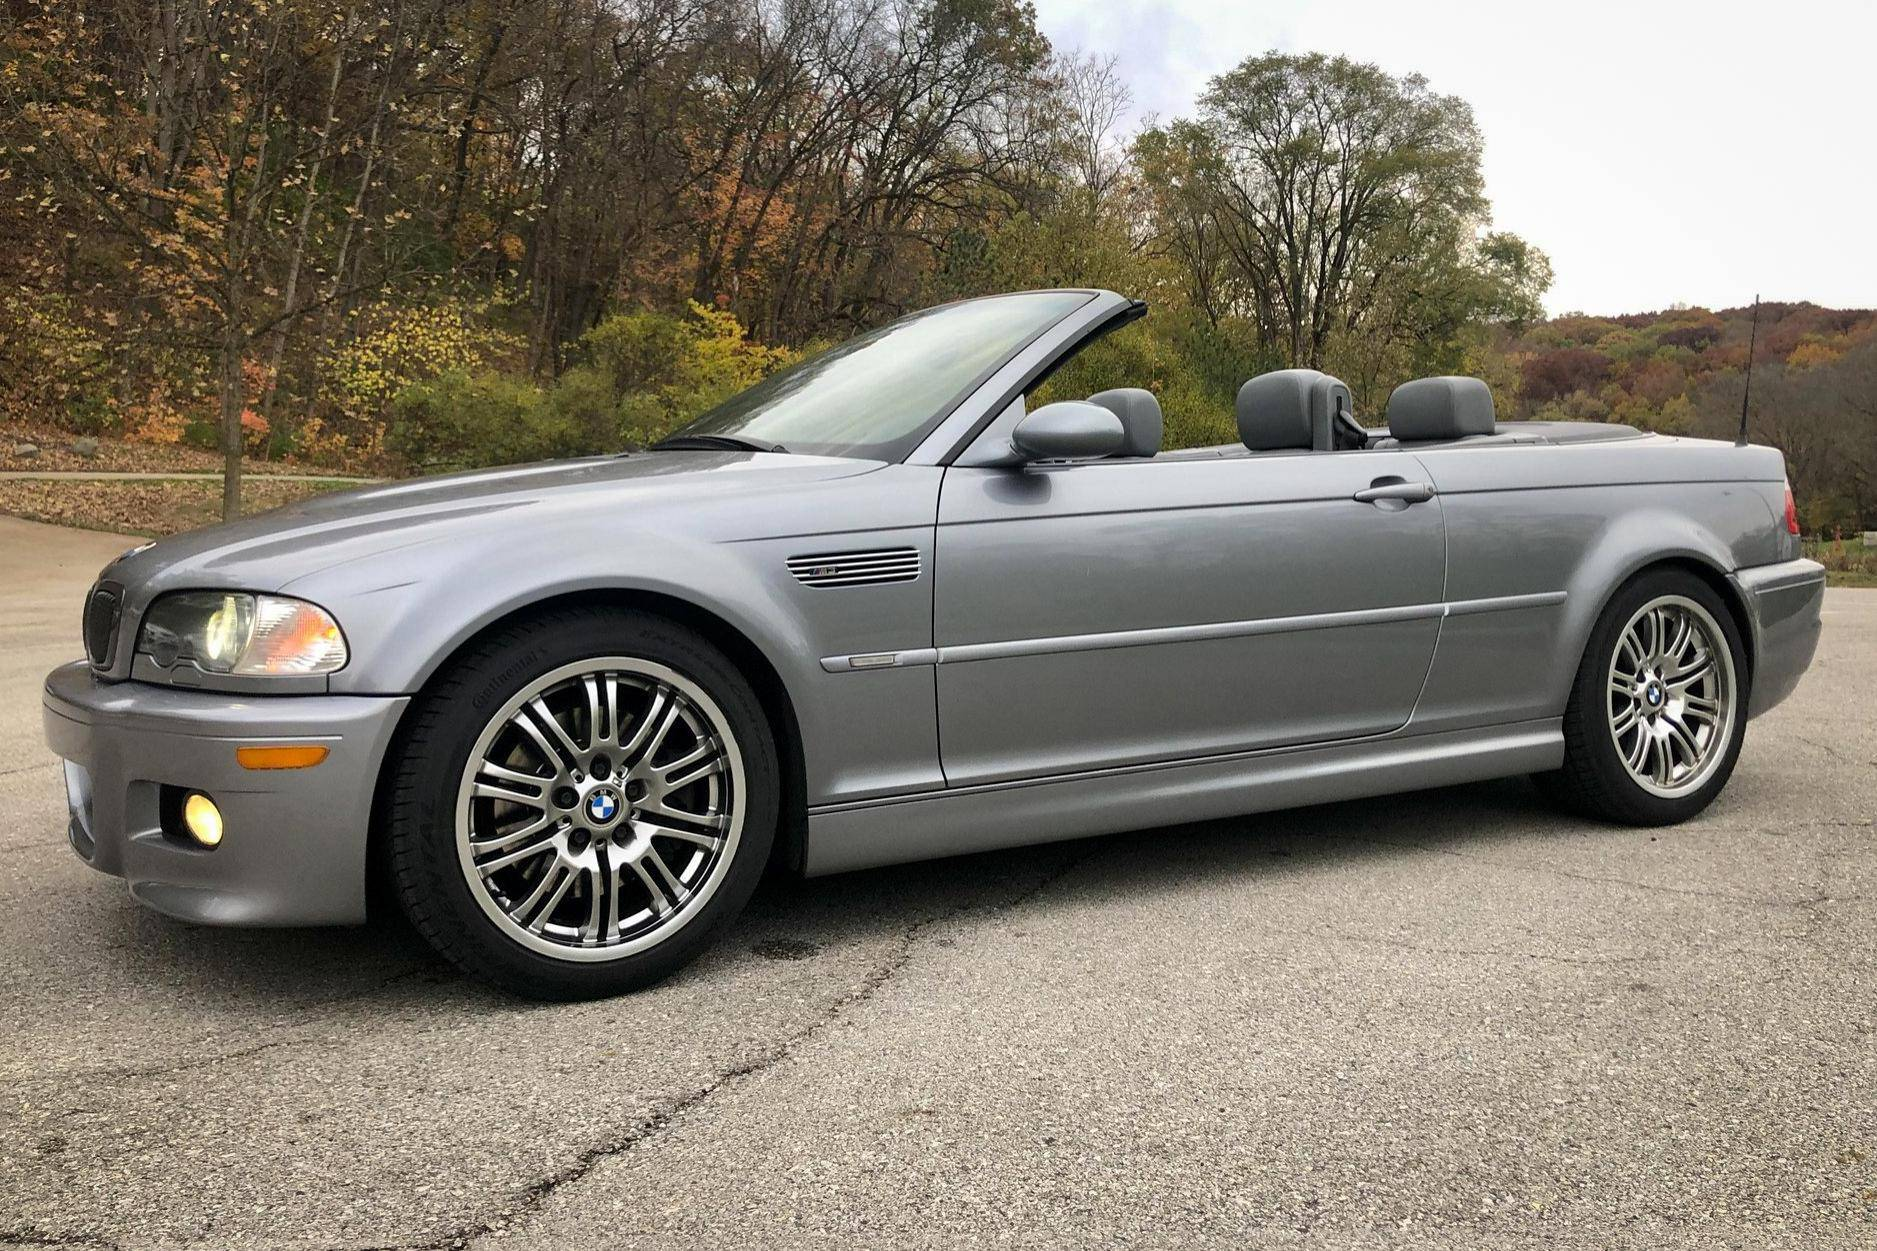 2003 Bmw M3 Convertible Auction Cars Bids